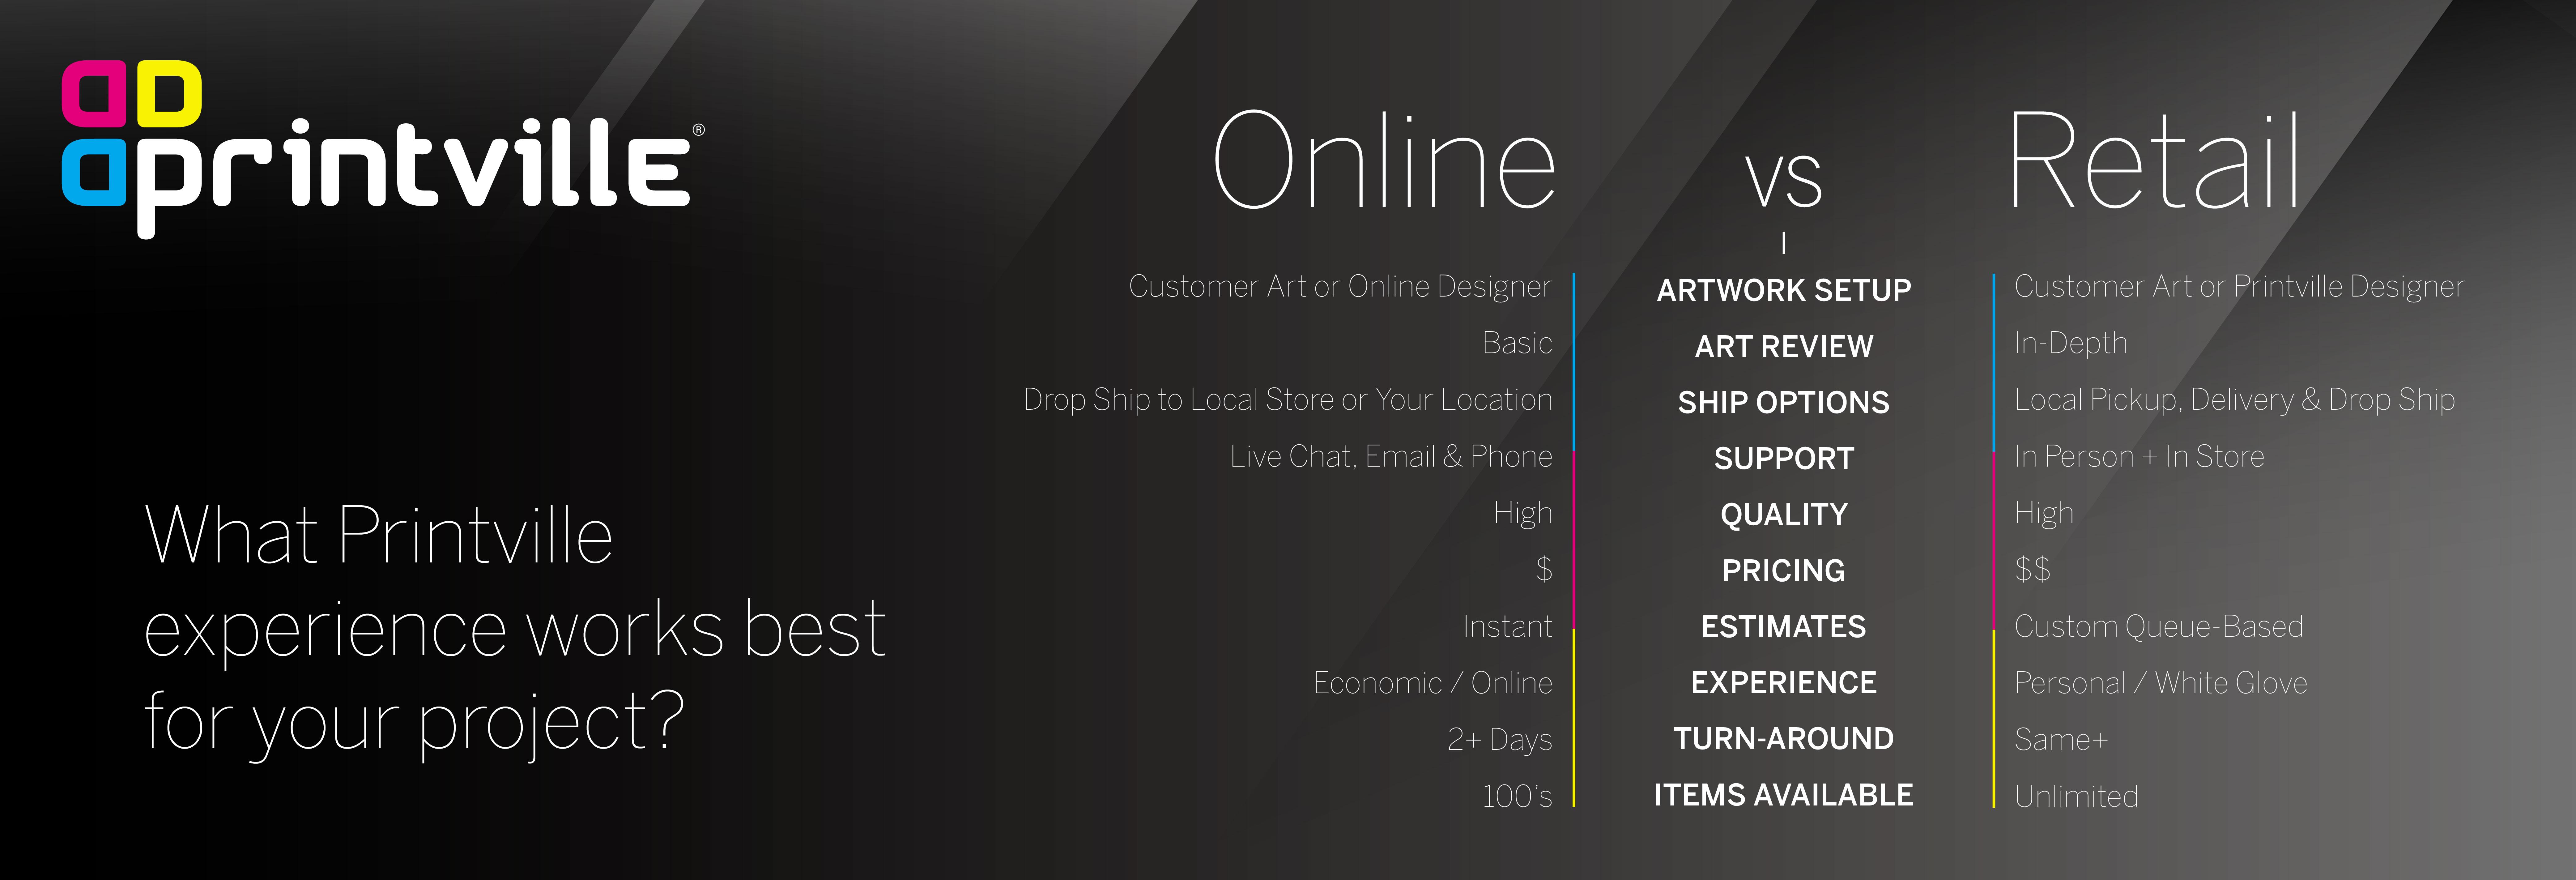 Online Store Vs. Retail Store